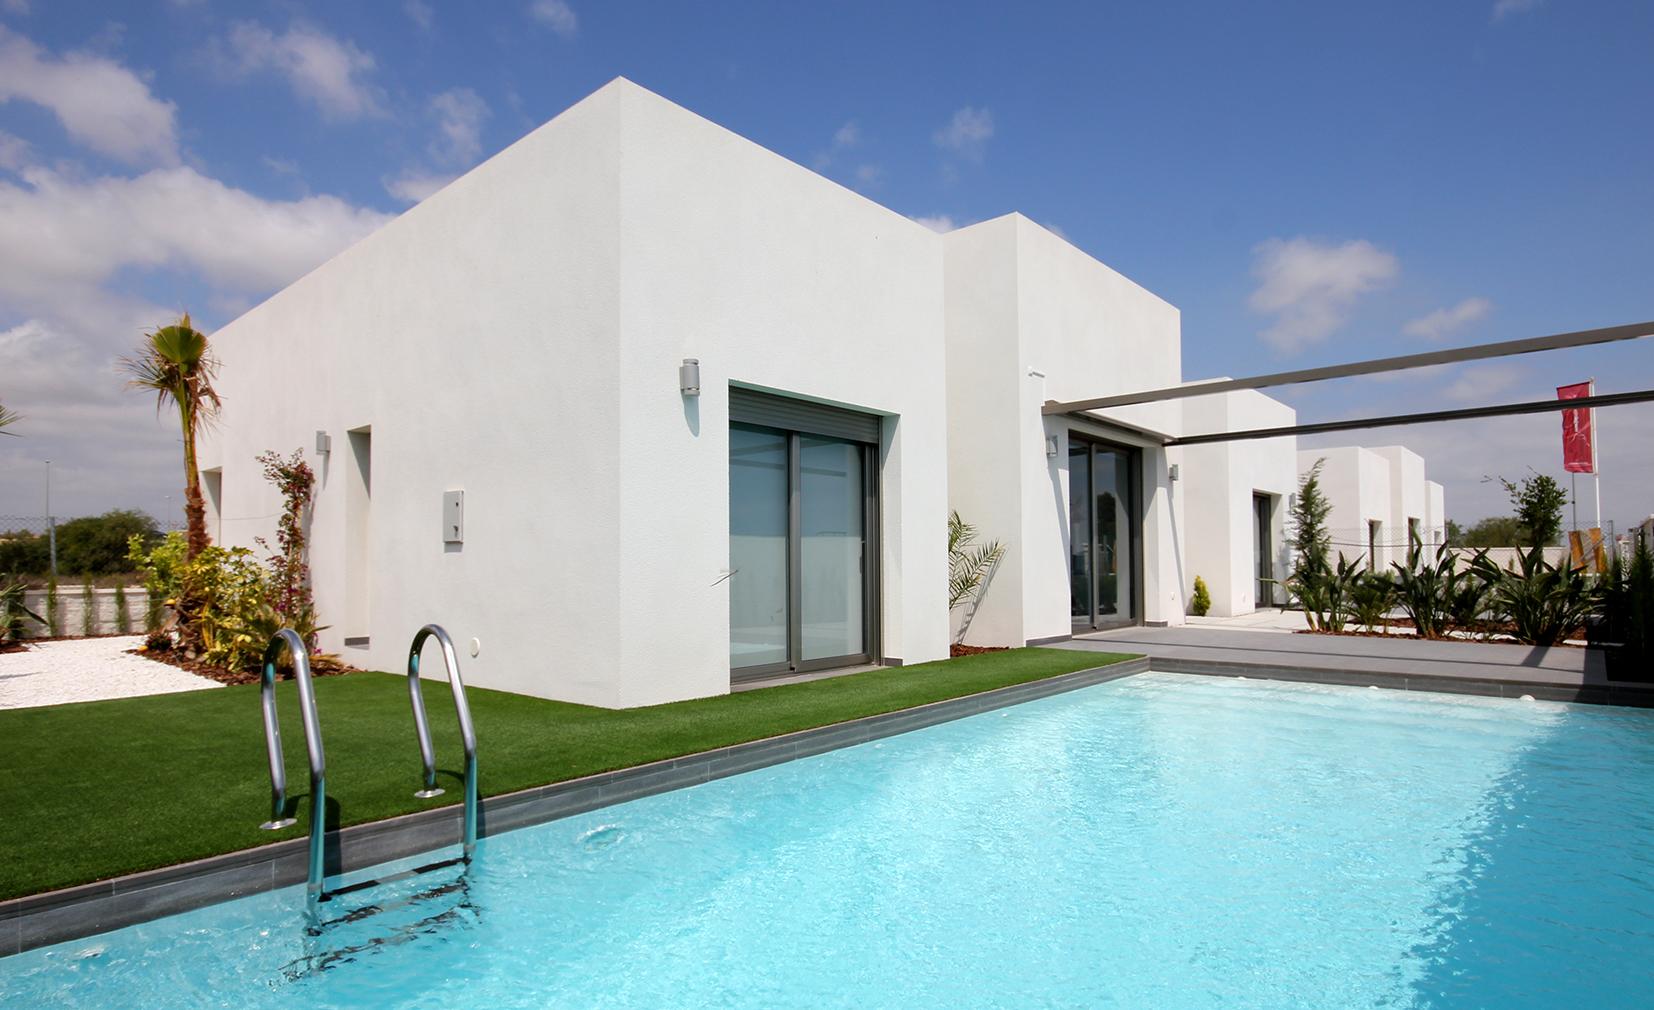 New Build villas 3 bedrooms 2 bathrooms in Benijofar